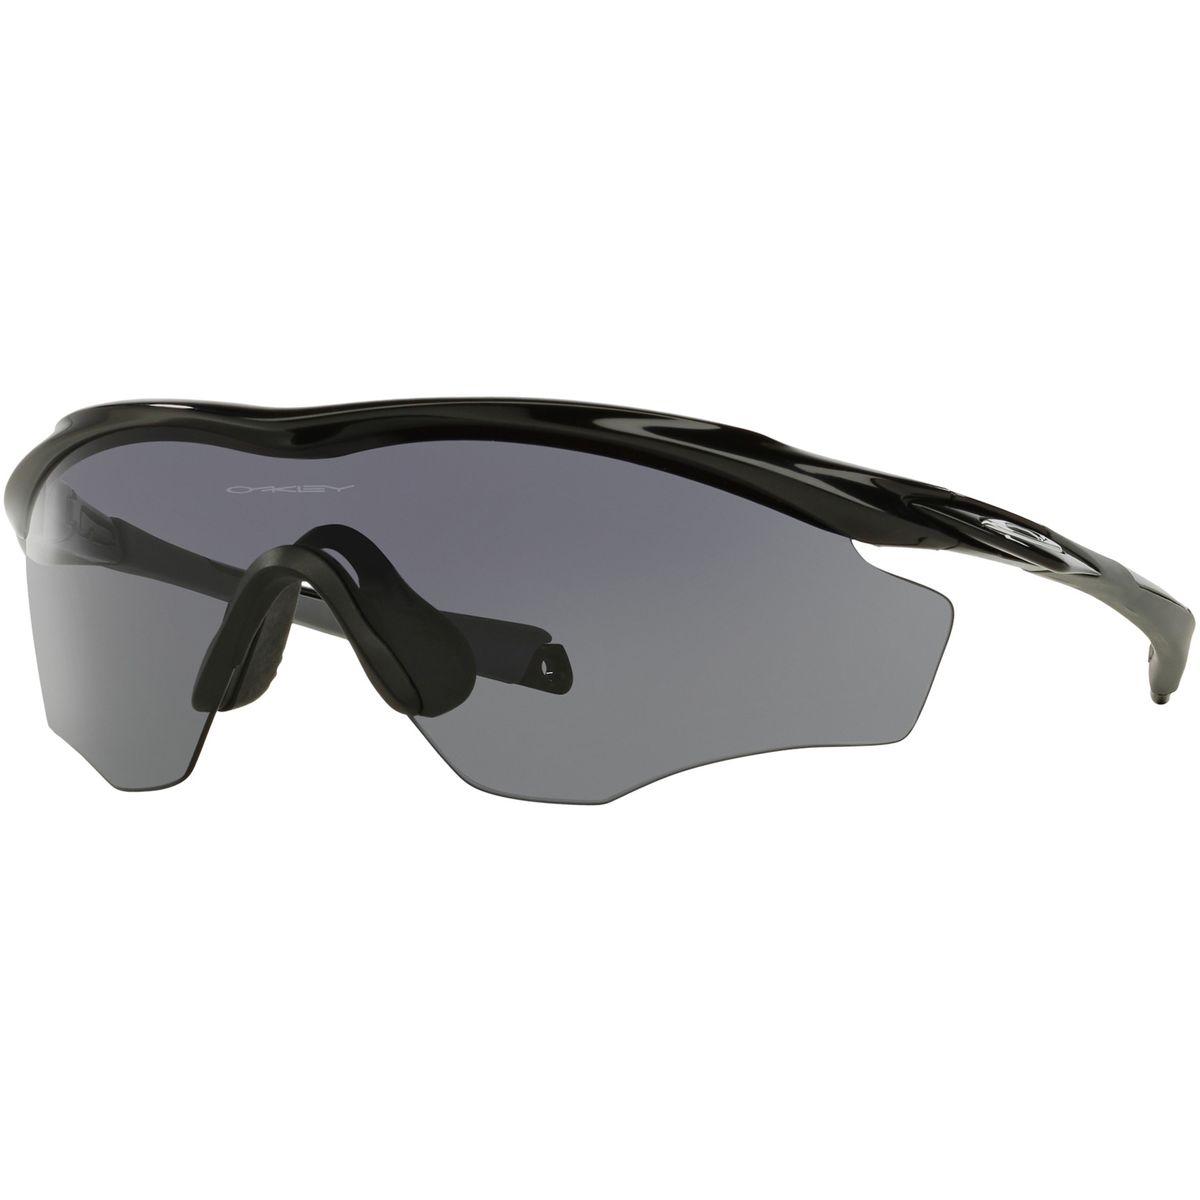 Oakley M2 Frame XL Sunglasses - Men's